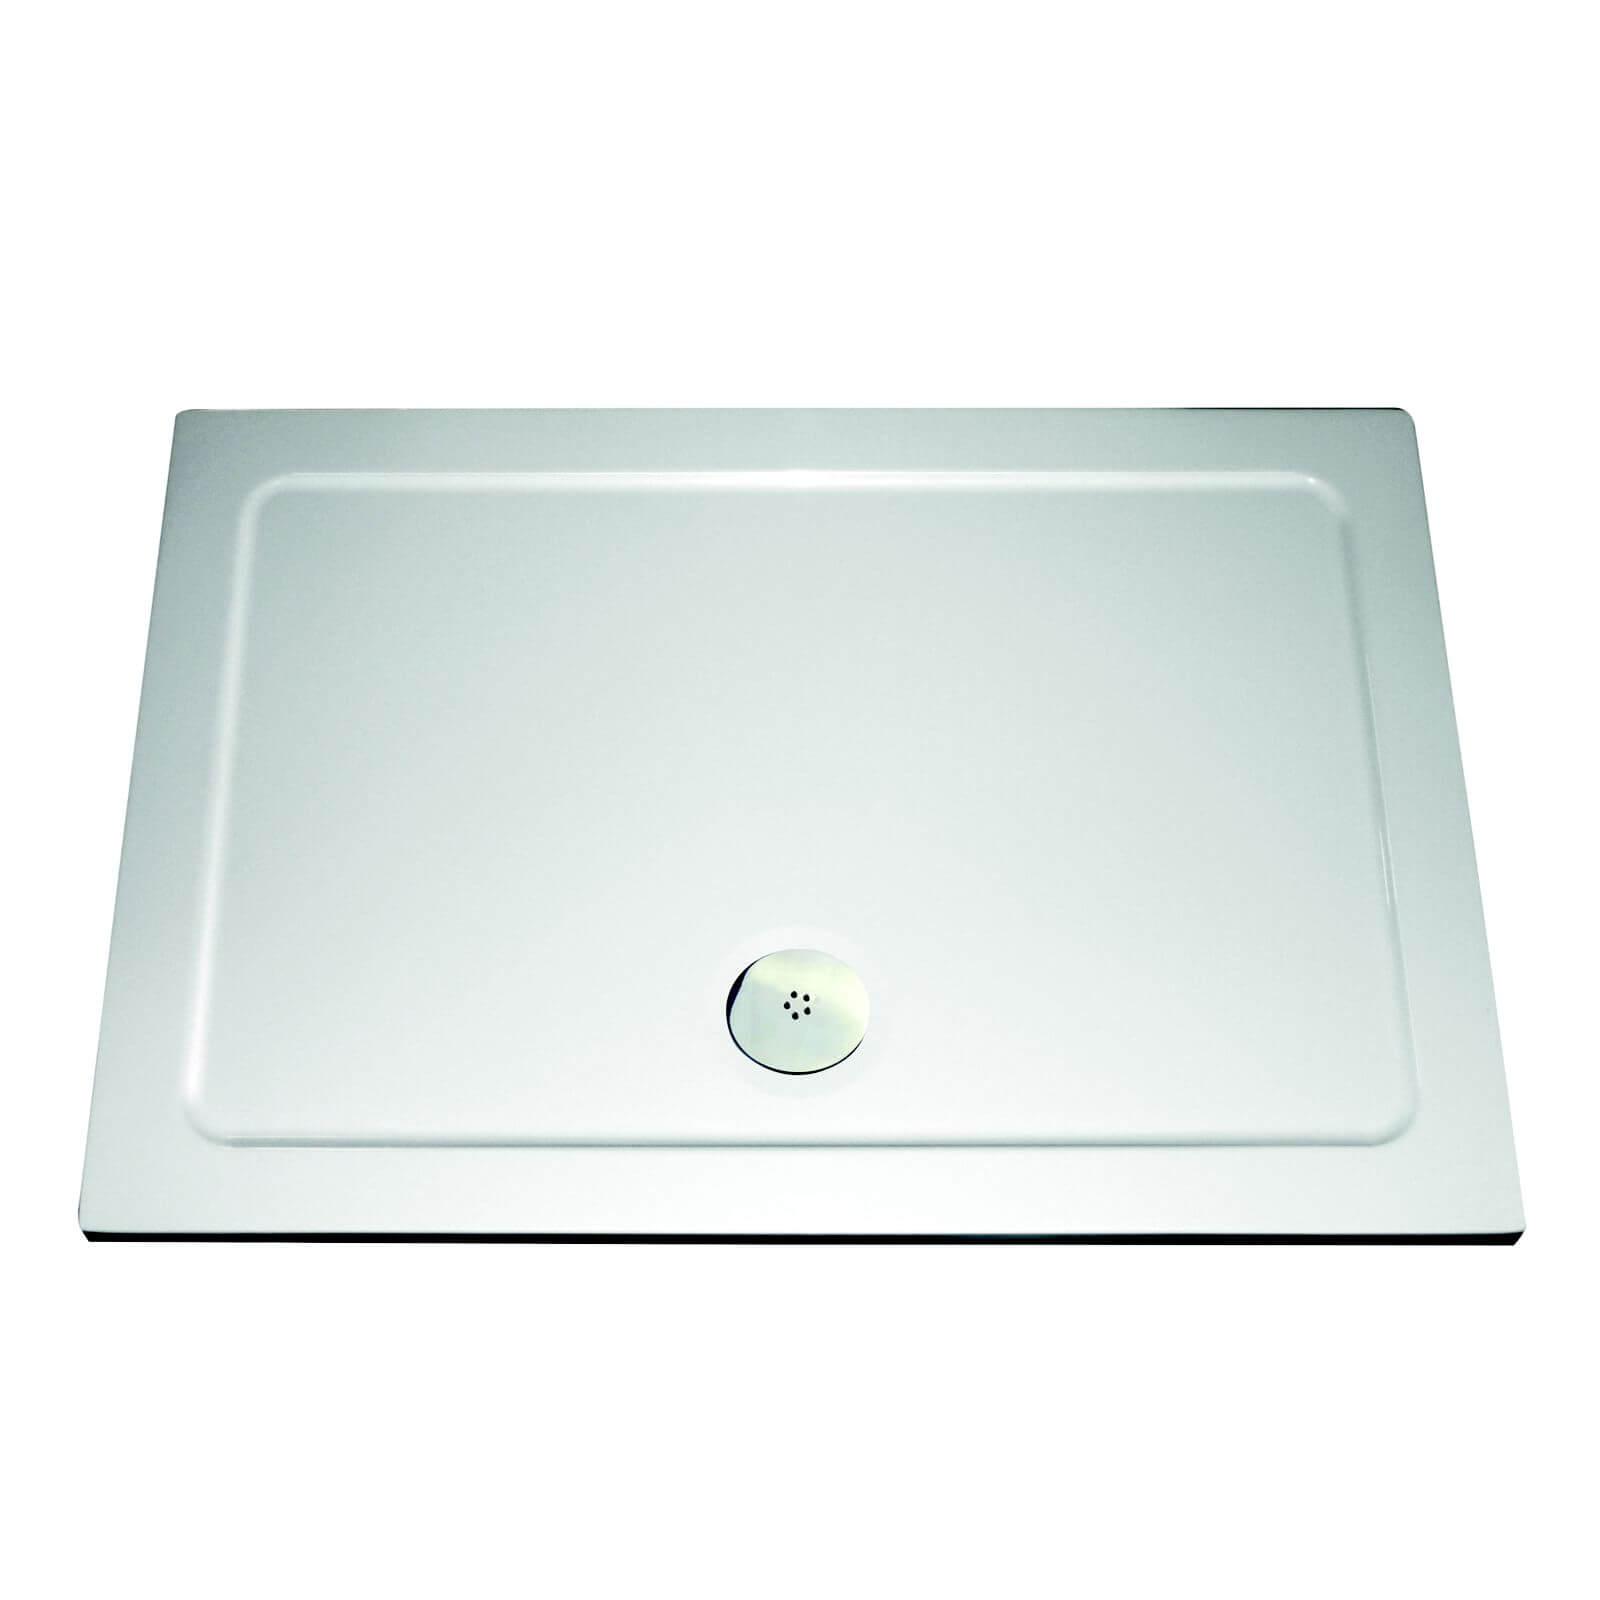 Aqualux Rectangular Shower Tray - 1200 x 900 x 35mm